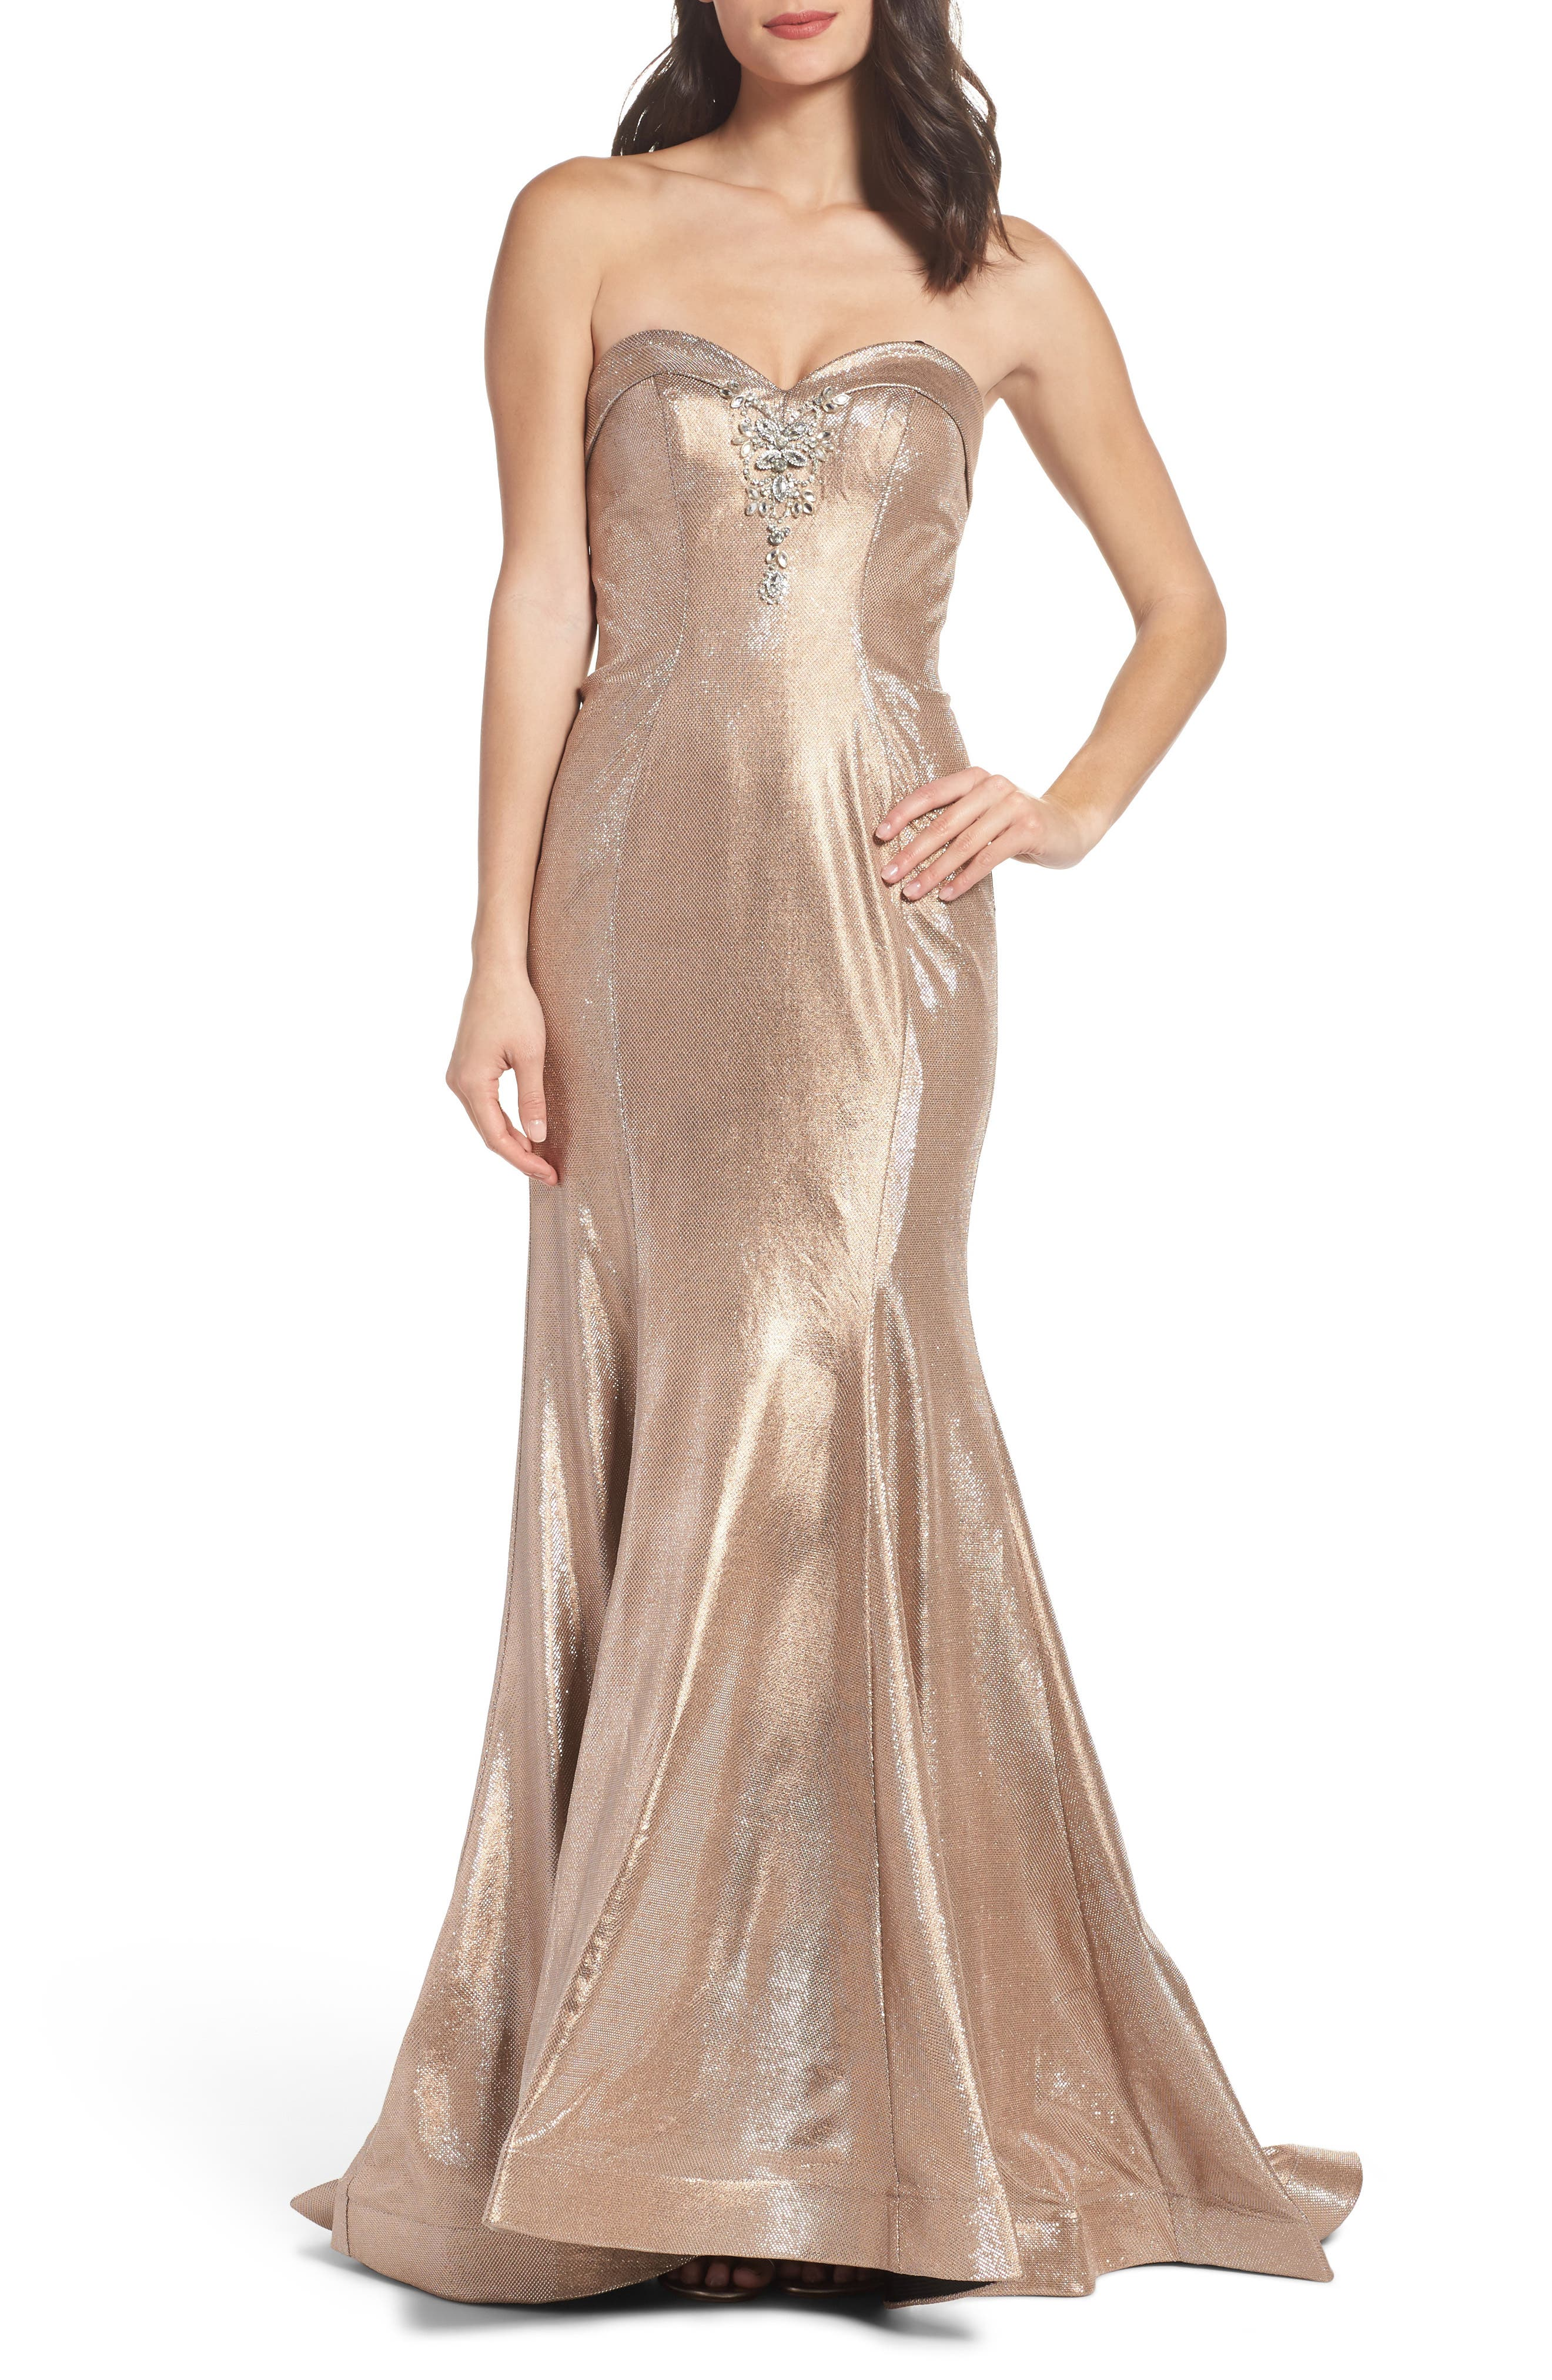 Metallic Mermaid Gown,                             Main thumbnail 1, color,                             272